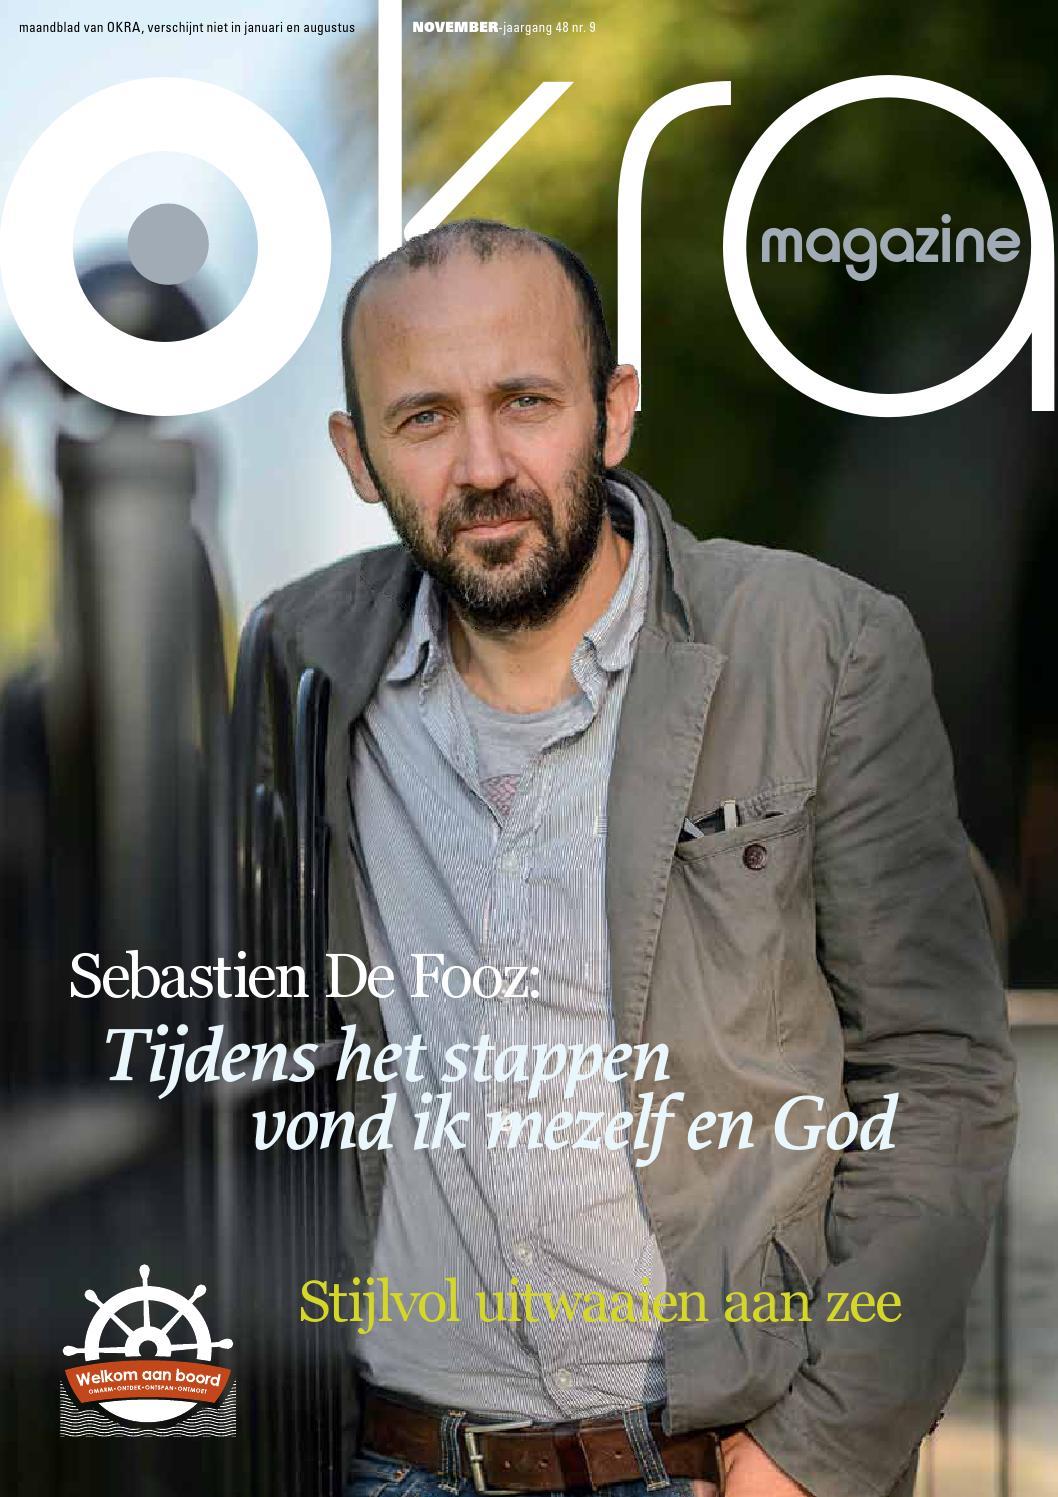 Okra magazine november 2015 by okra   issuu